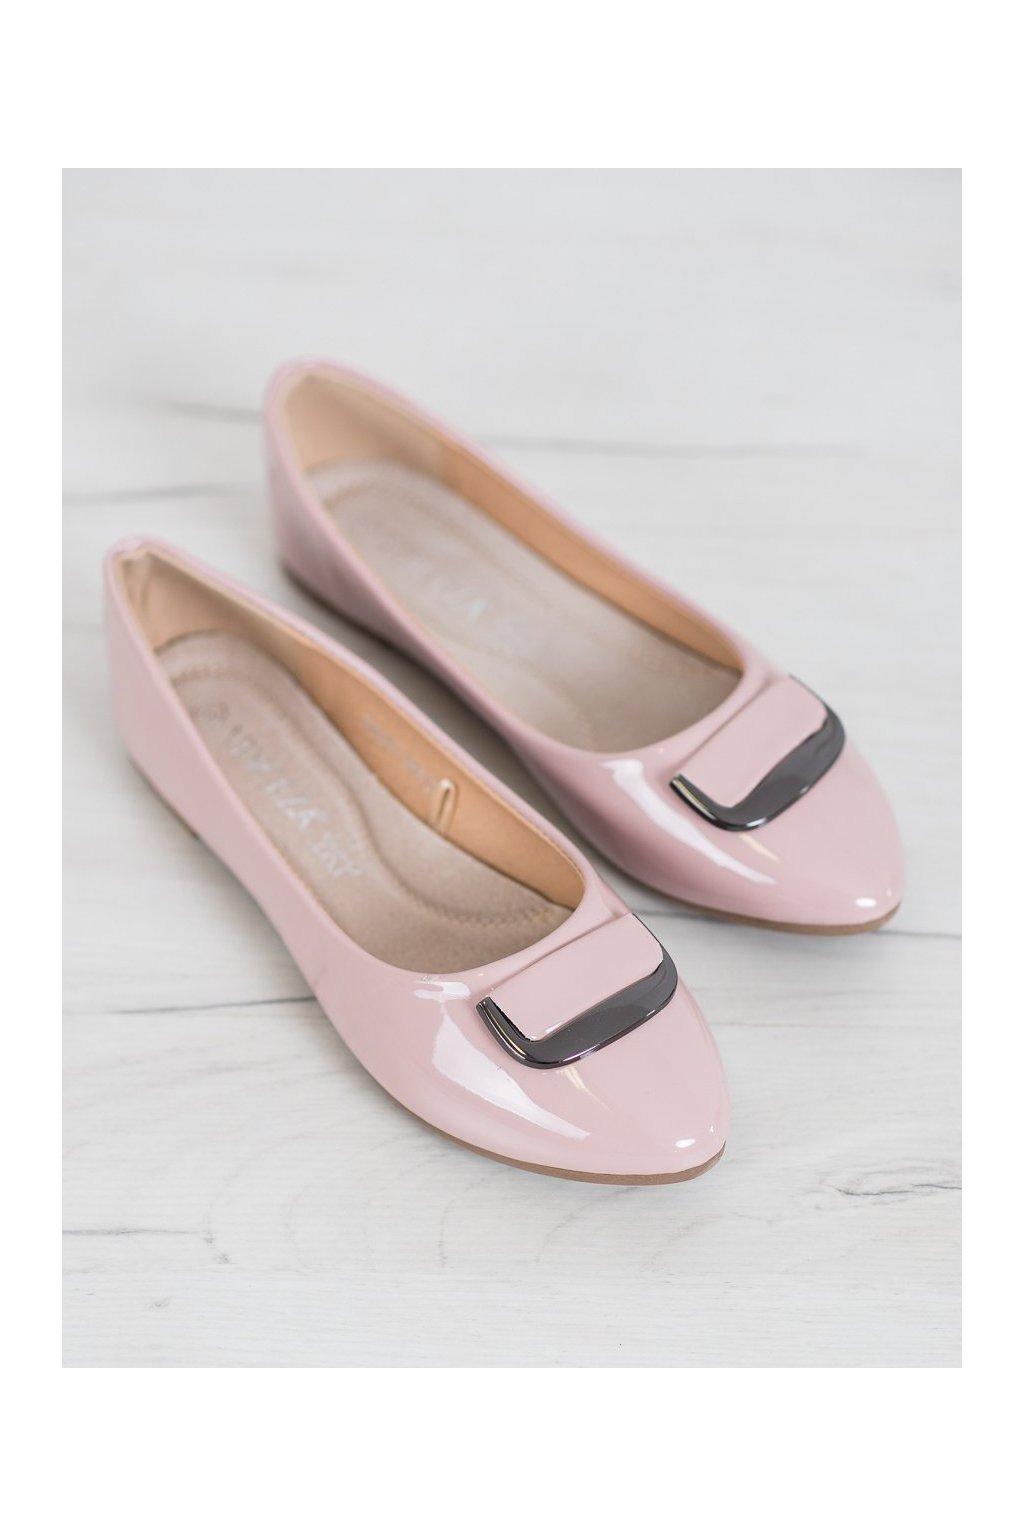 Ružové dámske balerínky Vinceza kod BOB20-18015P